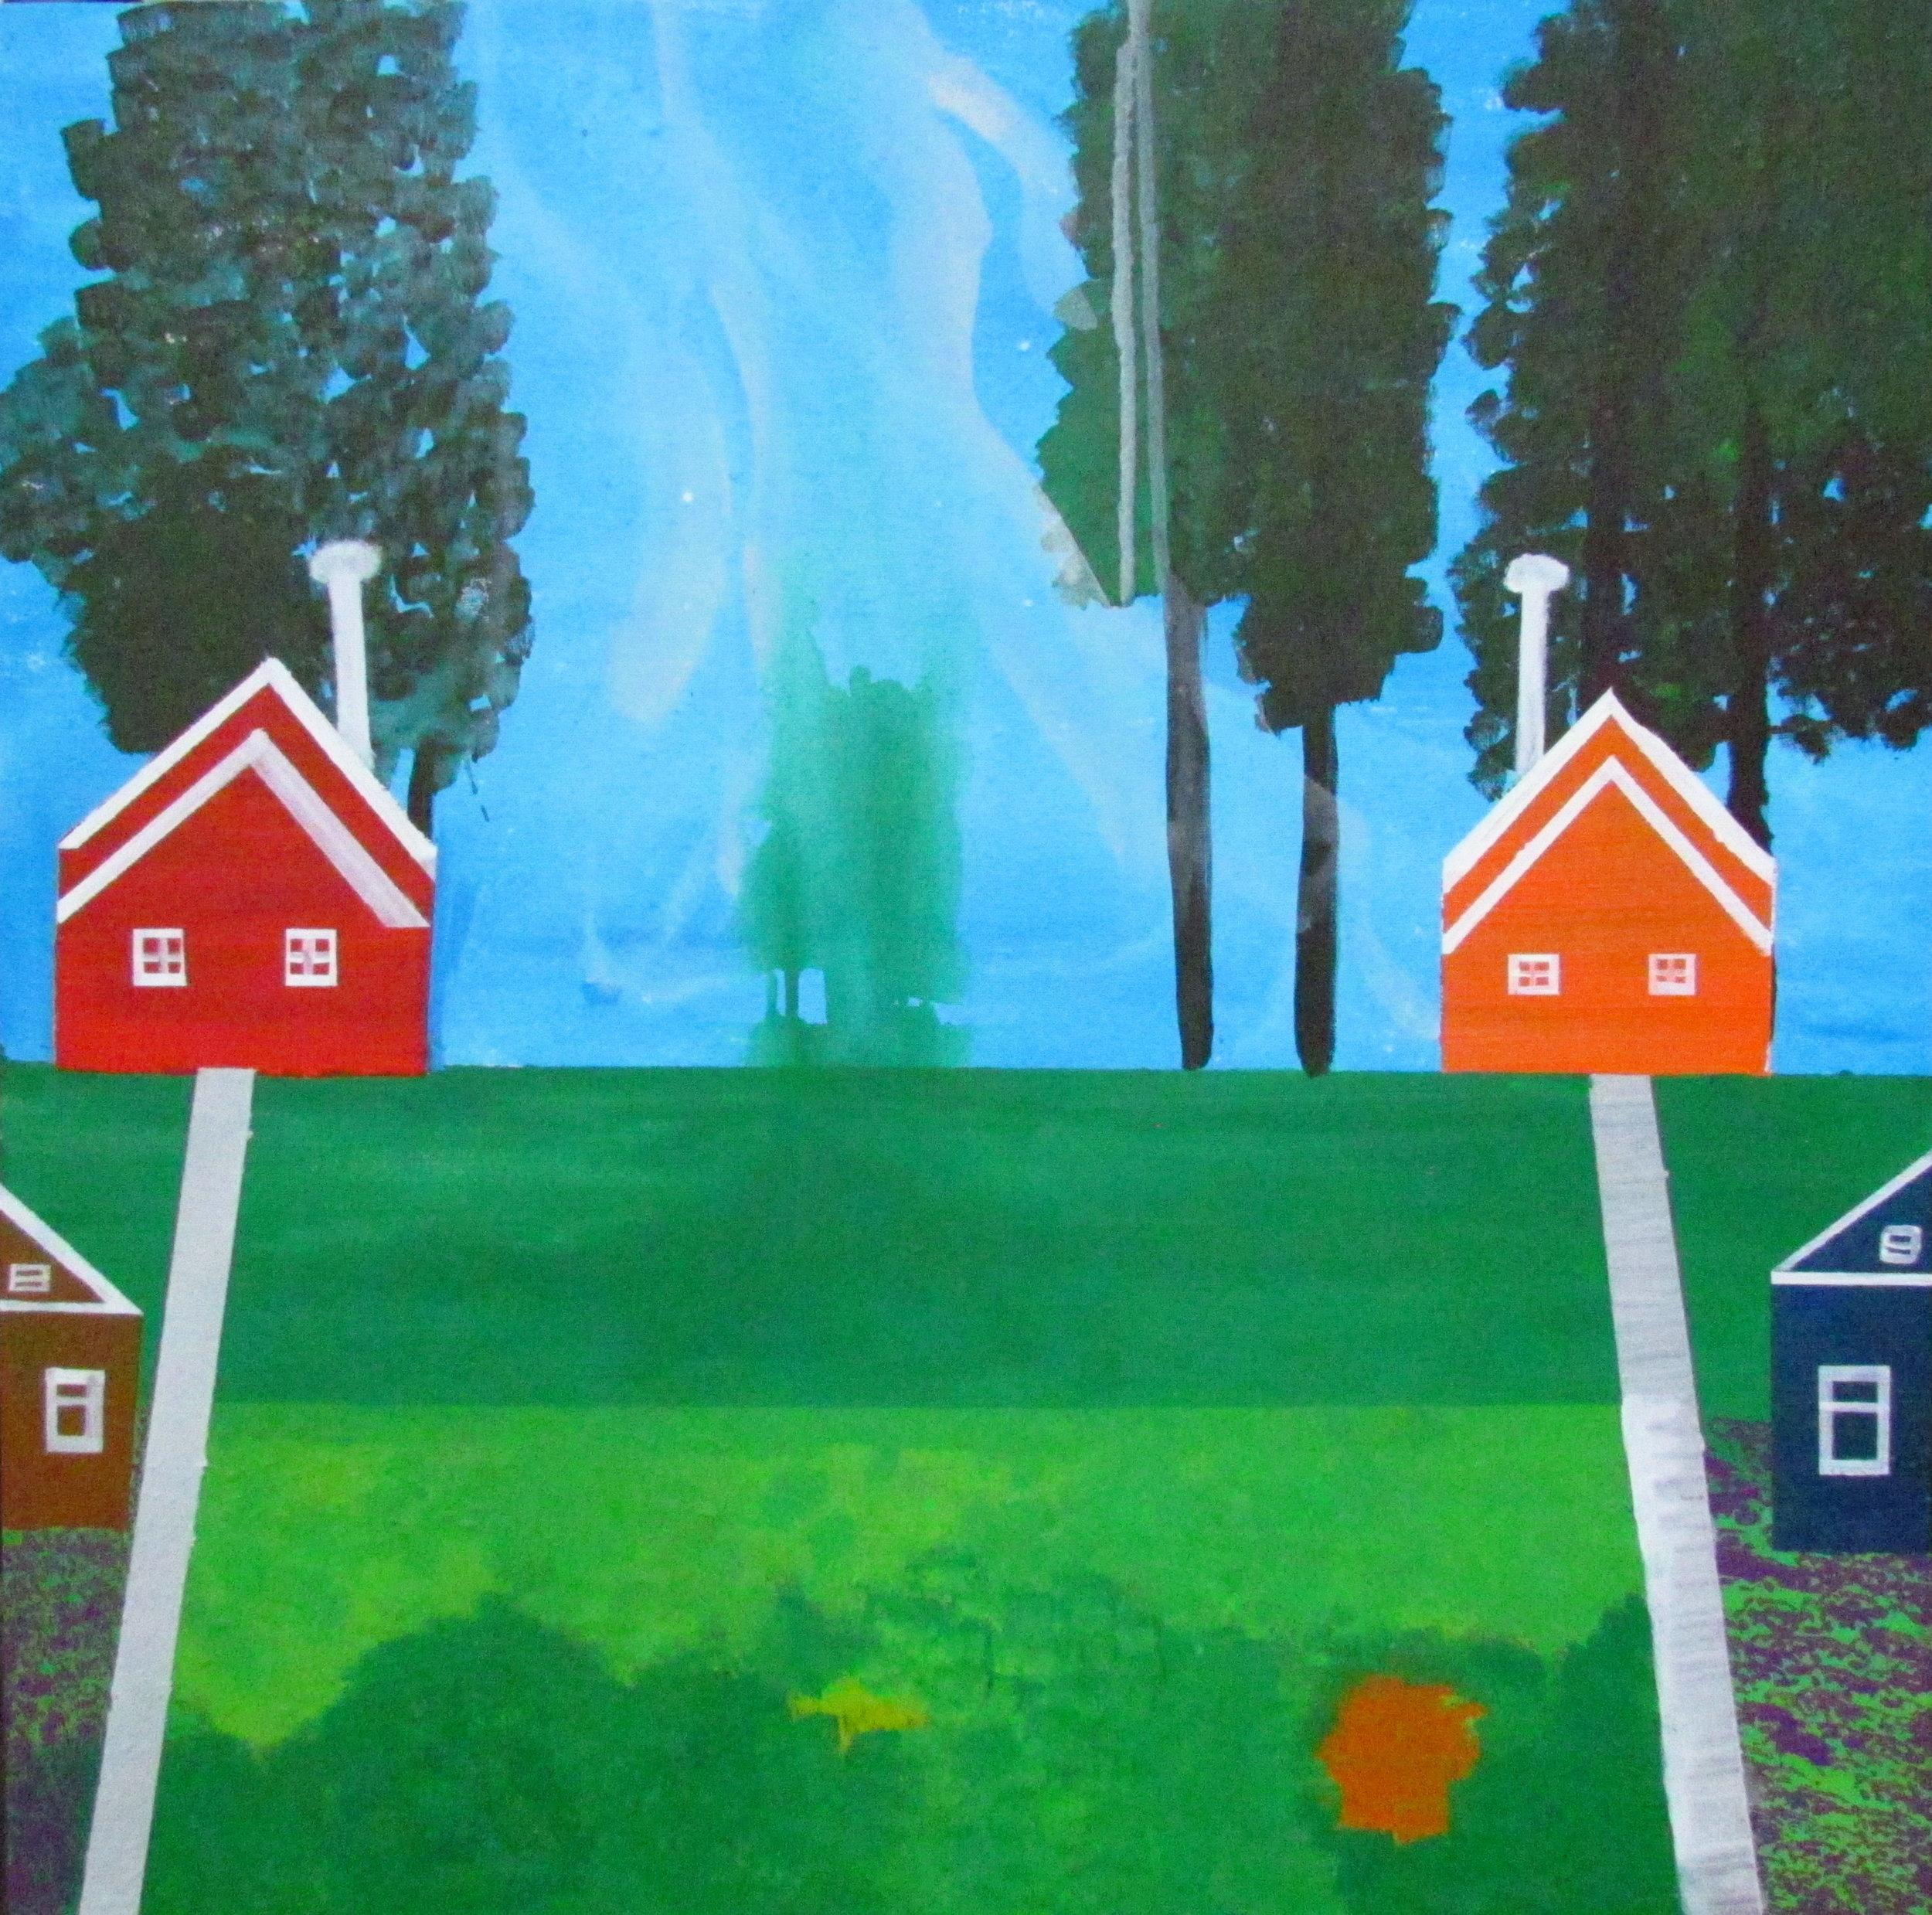 17 2016 Middle Class Village, Acrylic on canvas, Yaniv Janson 76X76cm.JPG